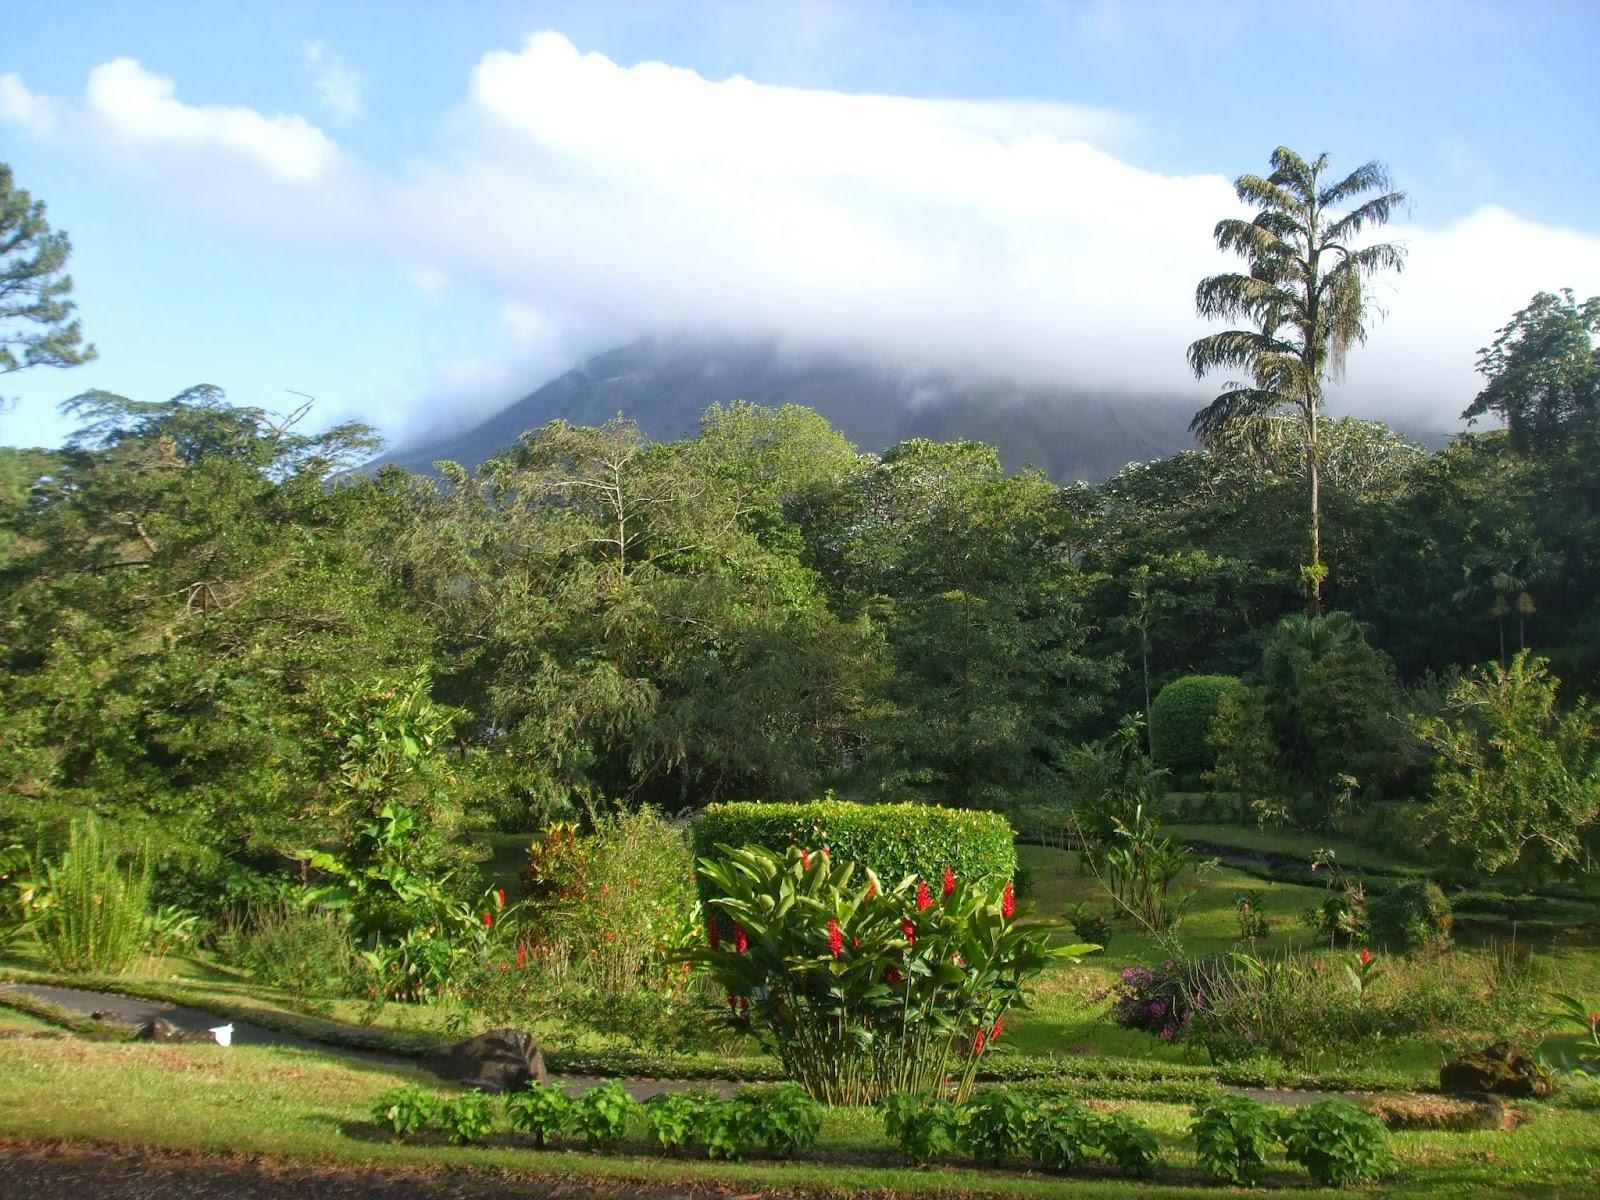 Rosemary39s Sampler Costa Rica Agua Dulce